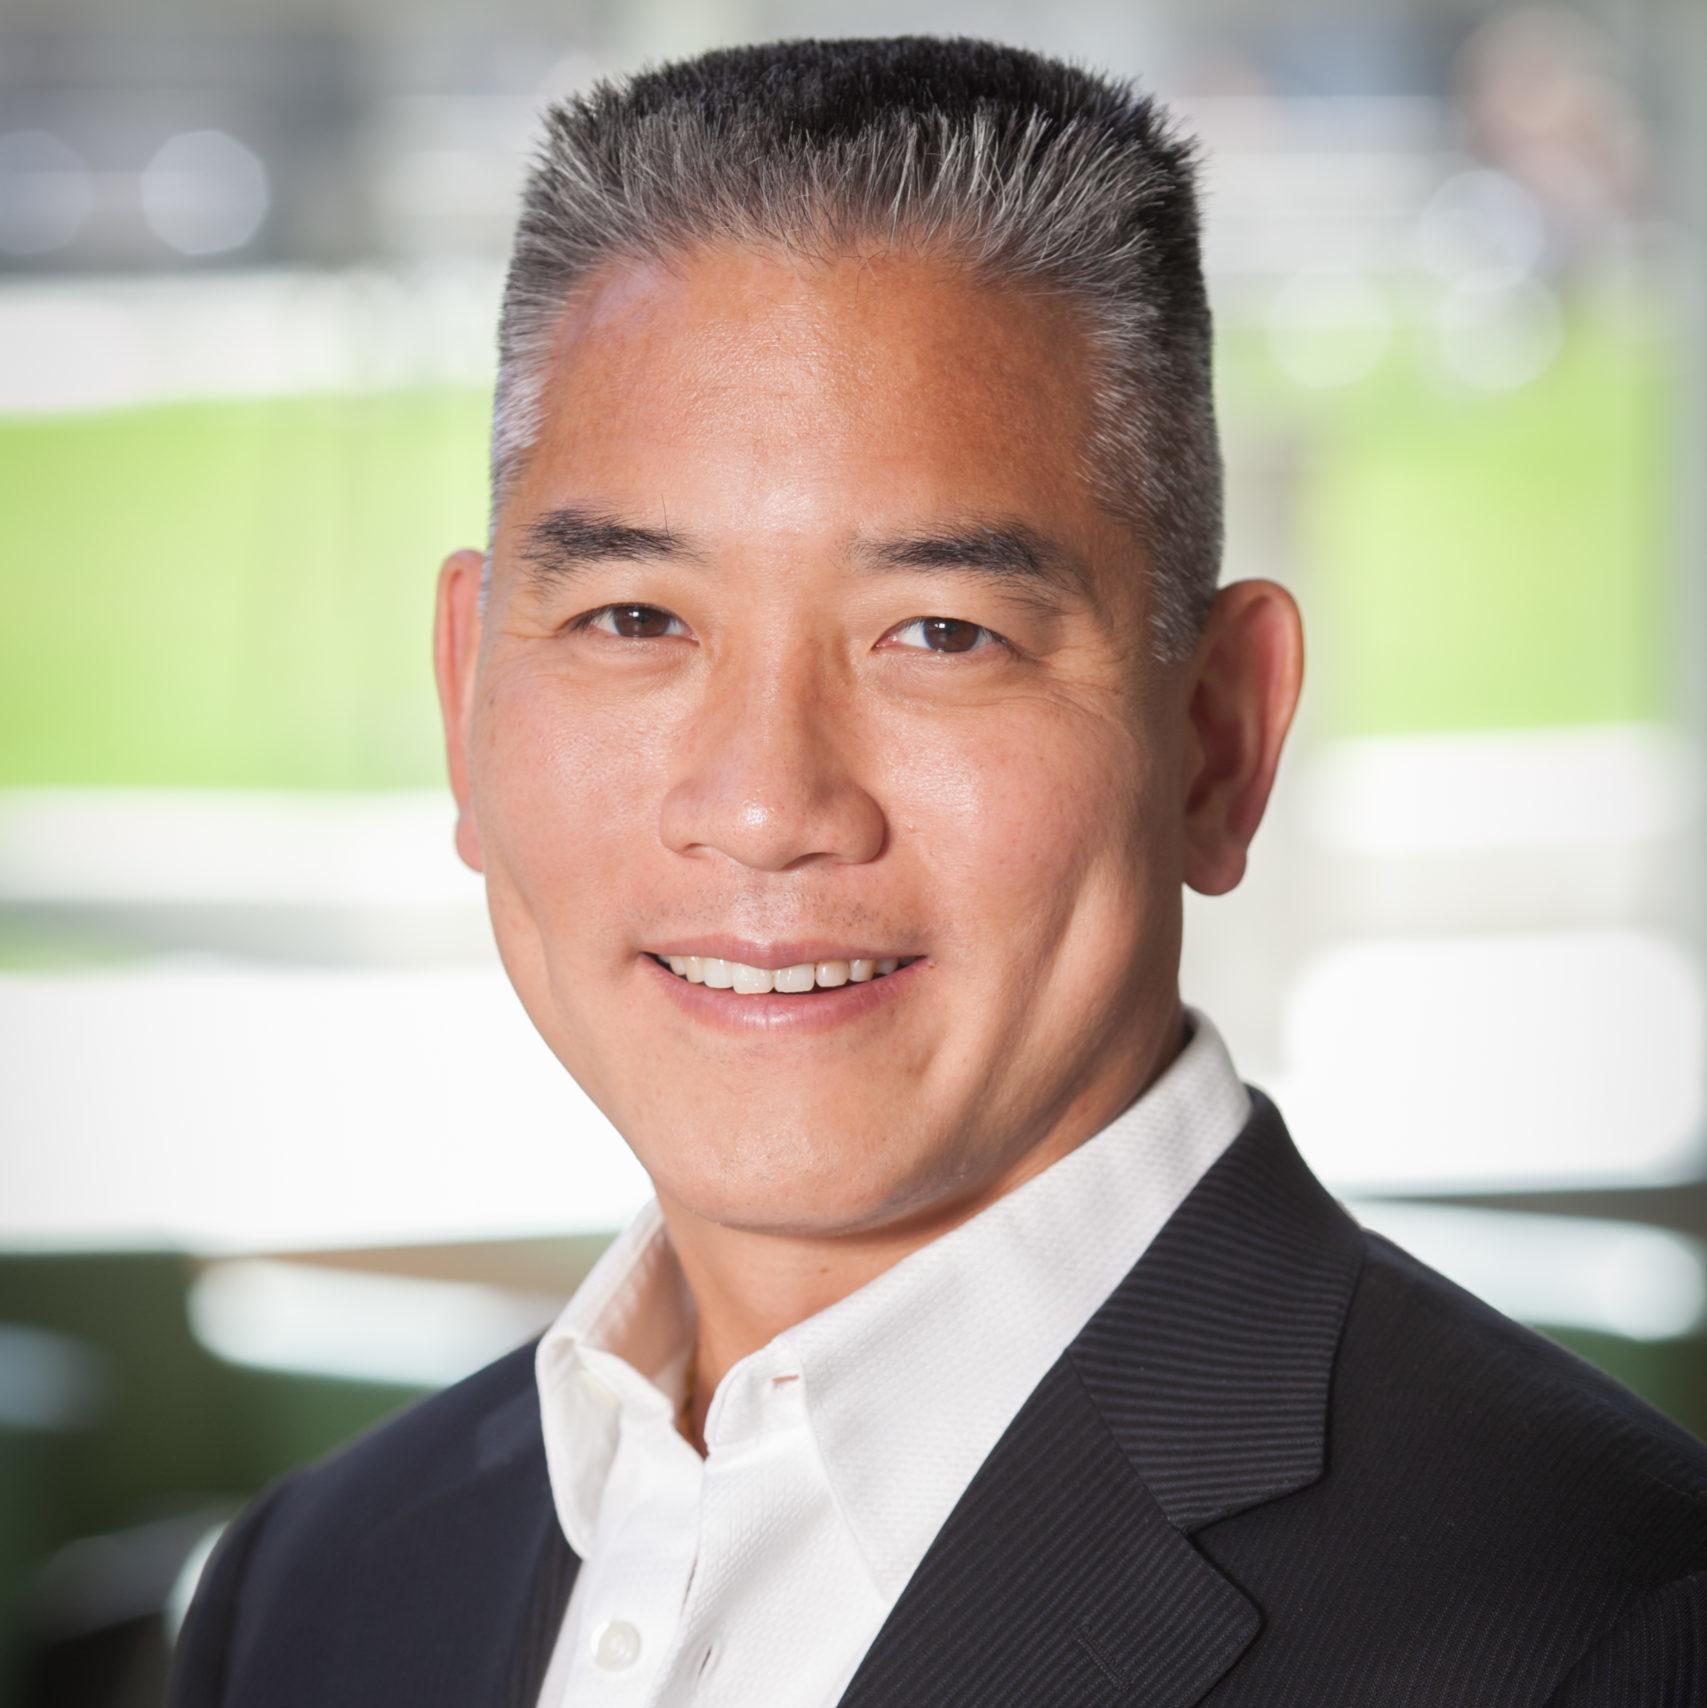 Dr. Brian Kwon